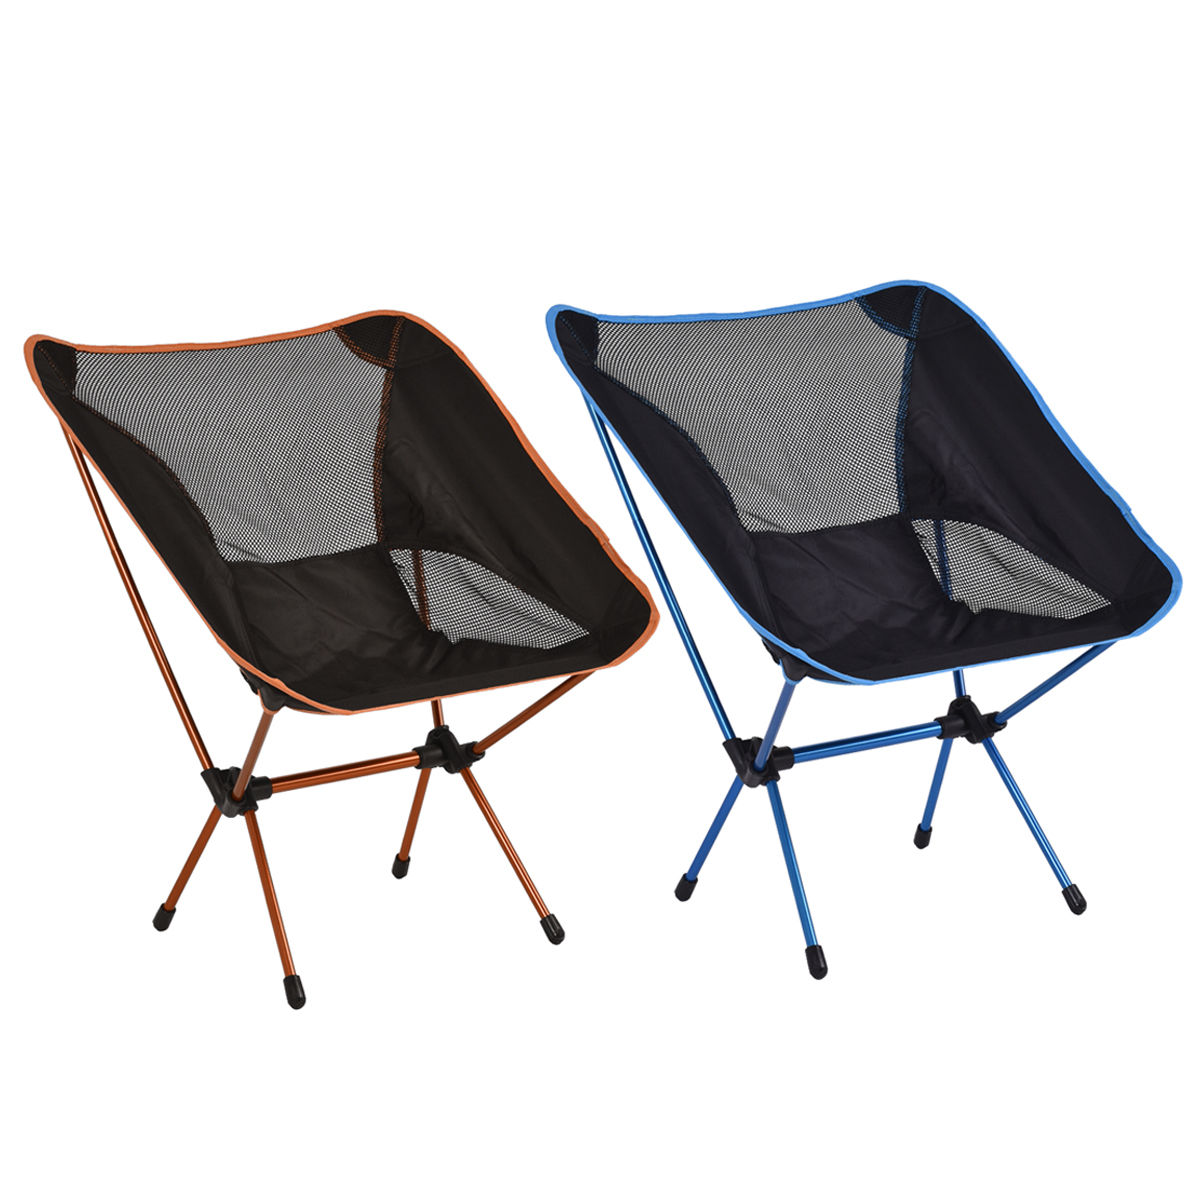 Costway Aluminum Hiking Camping Chair Fishing Seat Stool